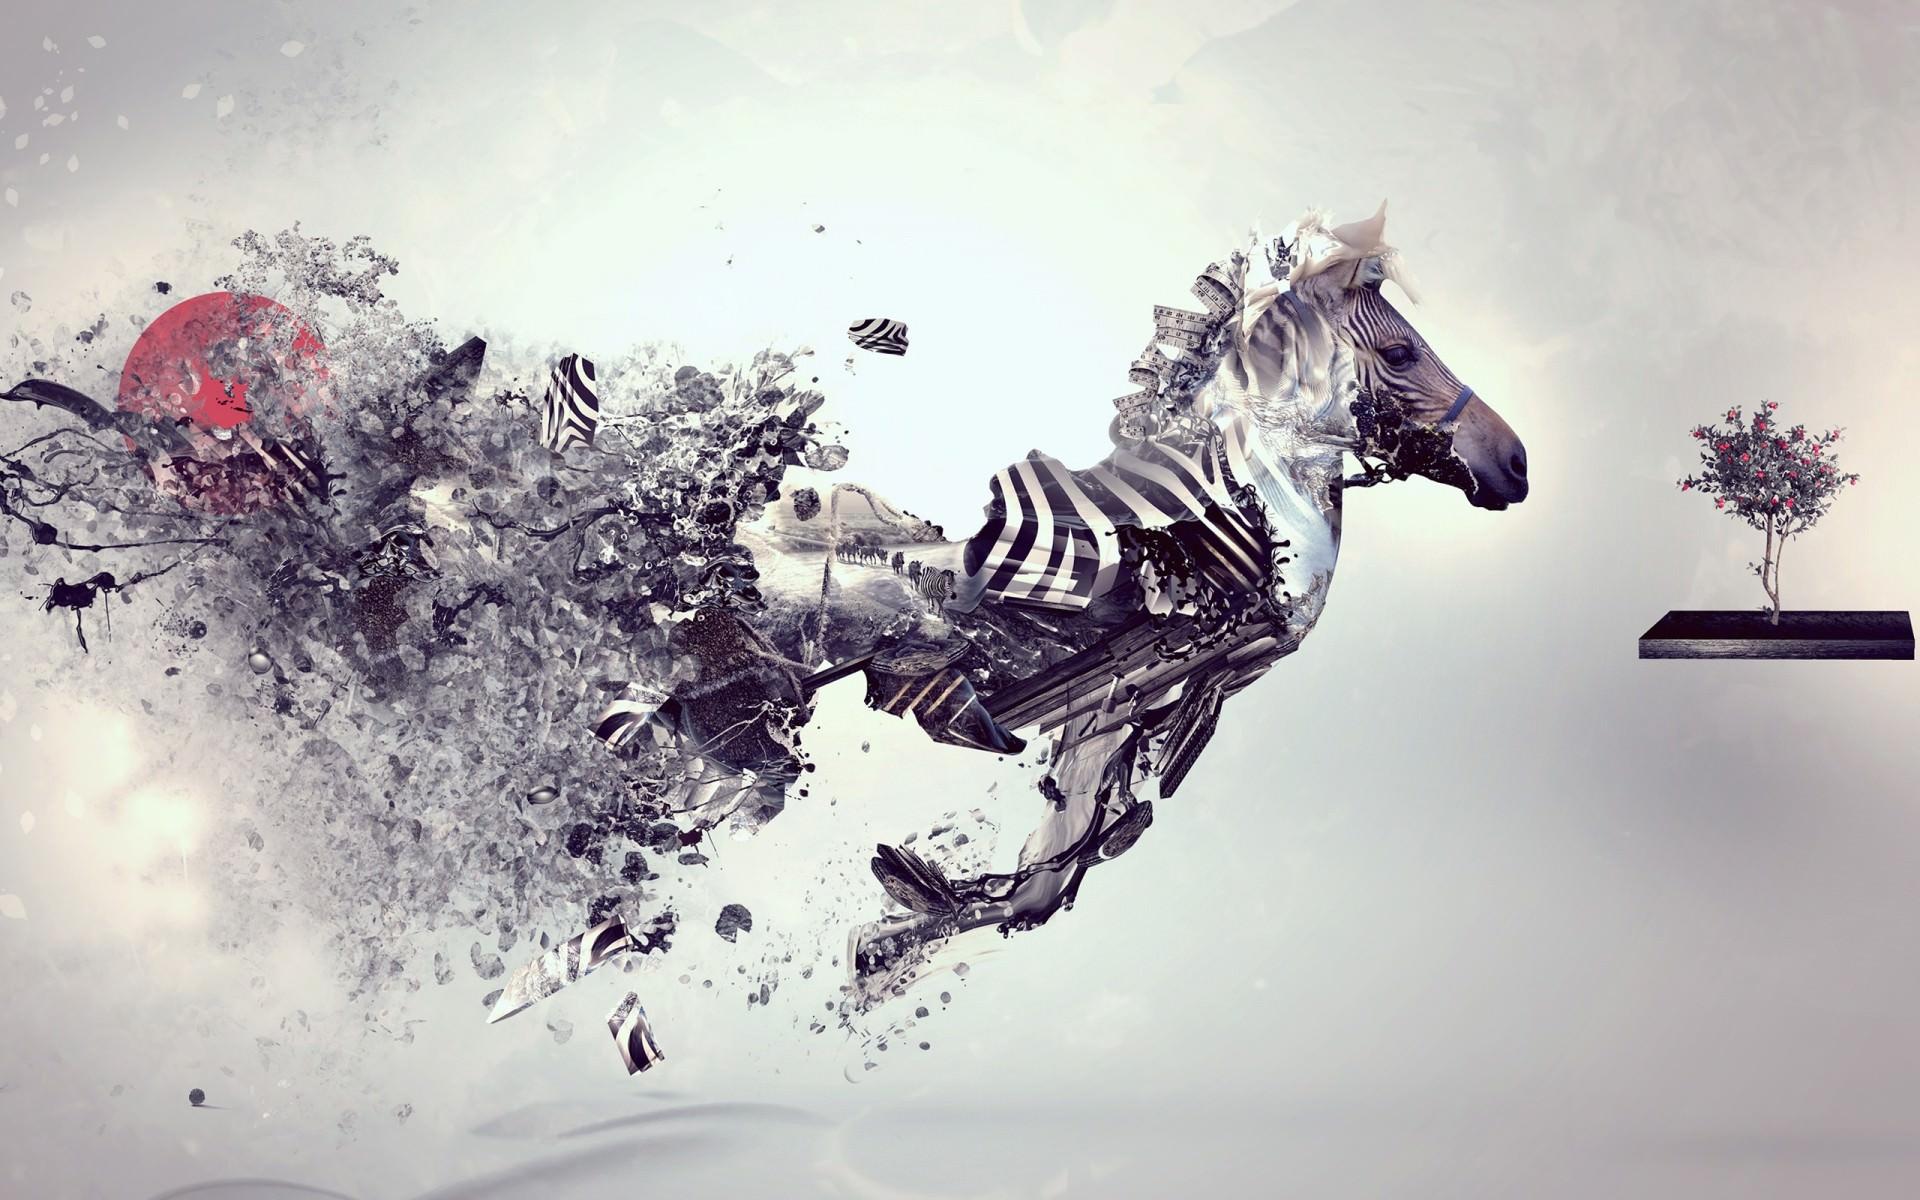 HD Zebra Artistic Wallpaper For Free